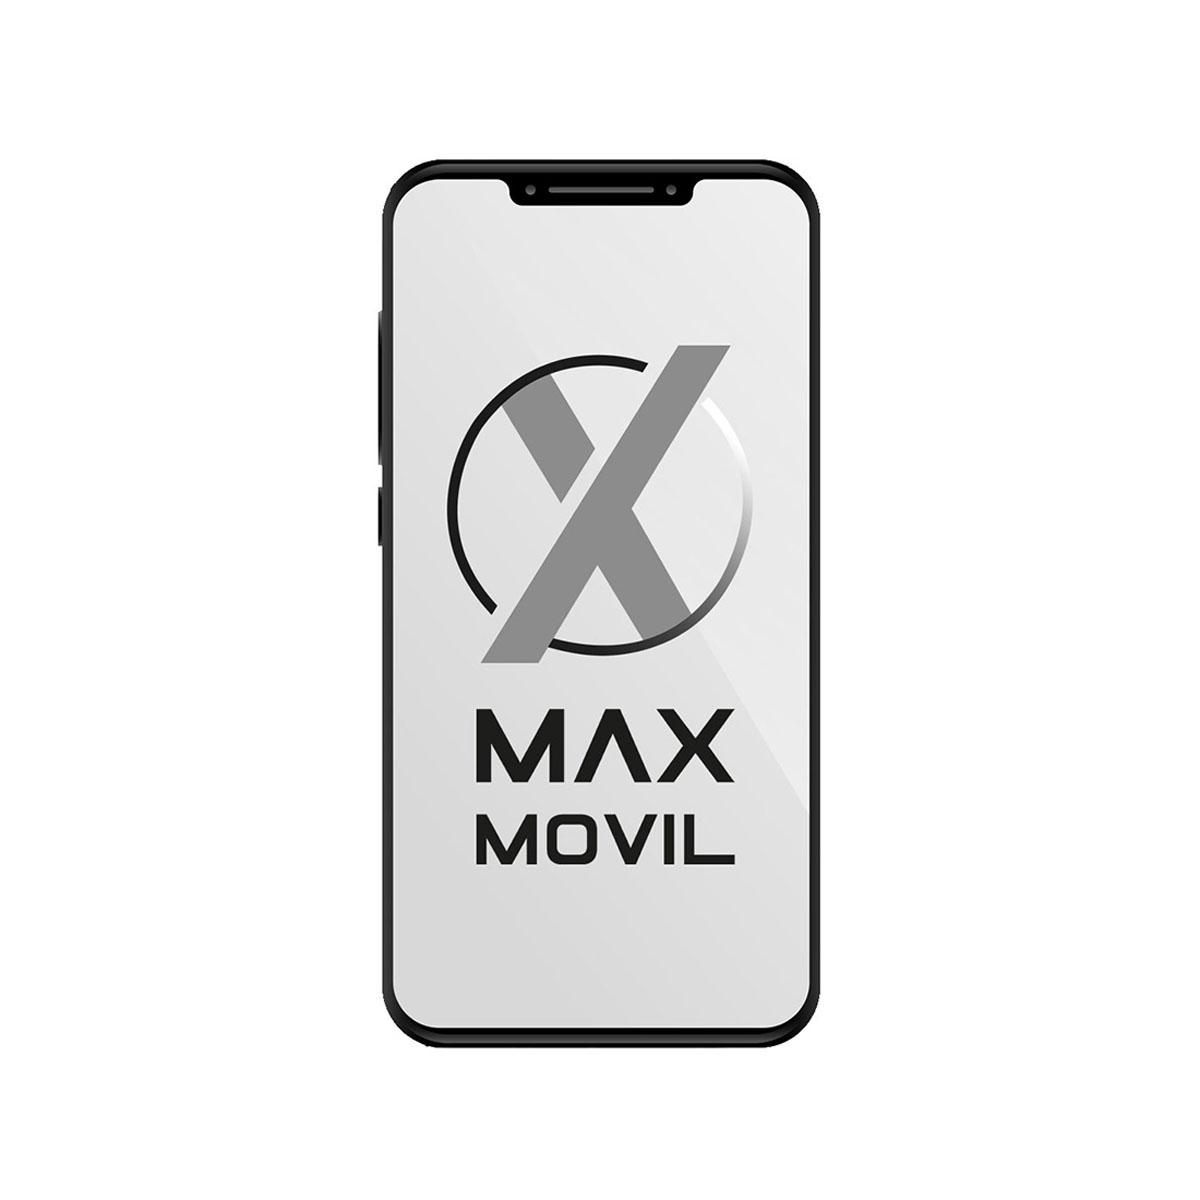 Funda Smart Cover para iPad mini 4 Rosa MNN32ZM/A